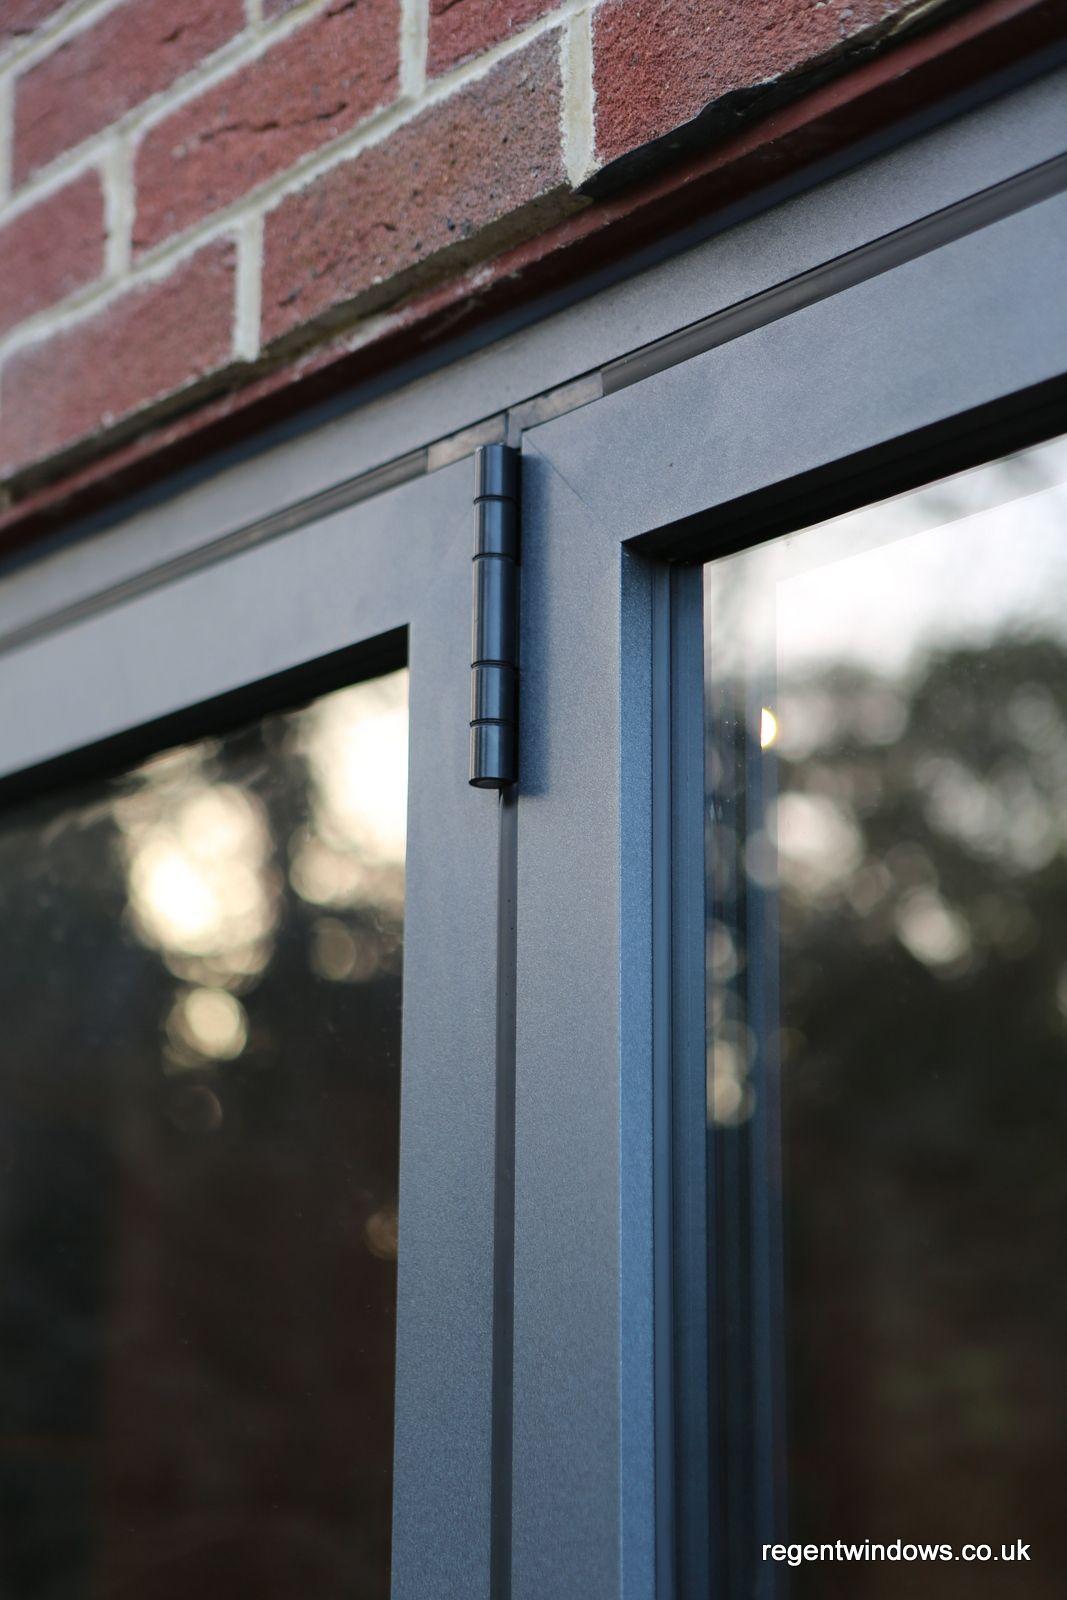 textured finish in ral 7016 windows windows. Black Bedroom Furniture Sets. Home Design Ideas